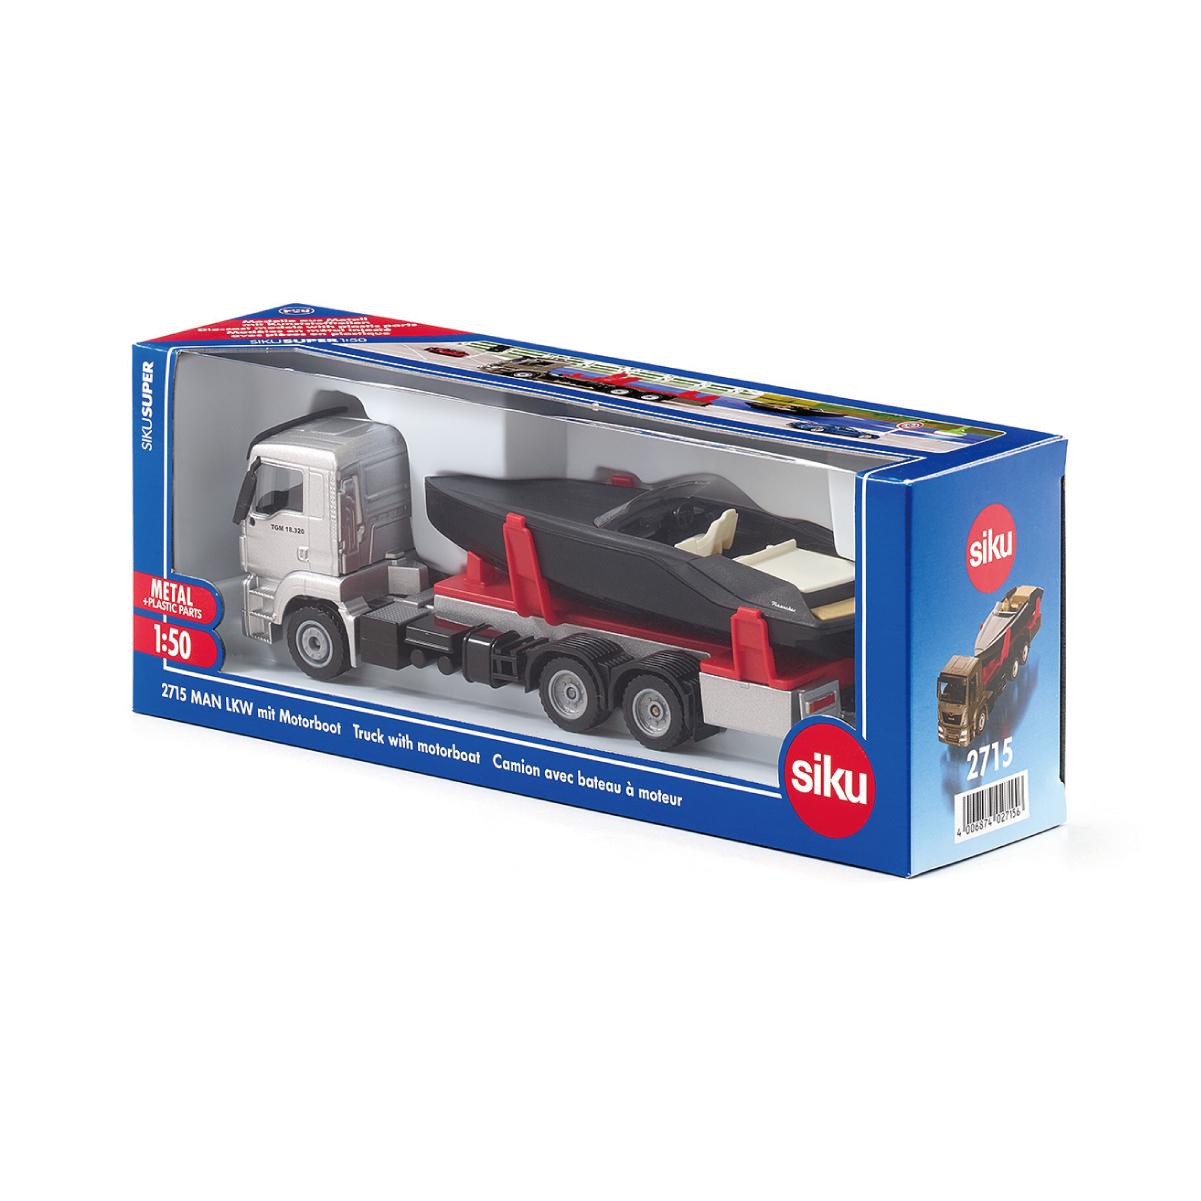 MAN モーターボート付きトラック 1:50(ジク・SIKU)